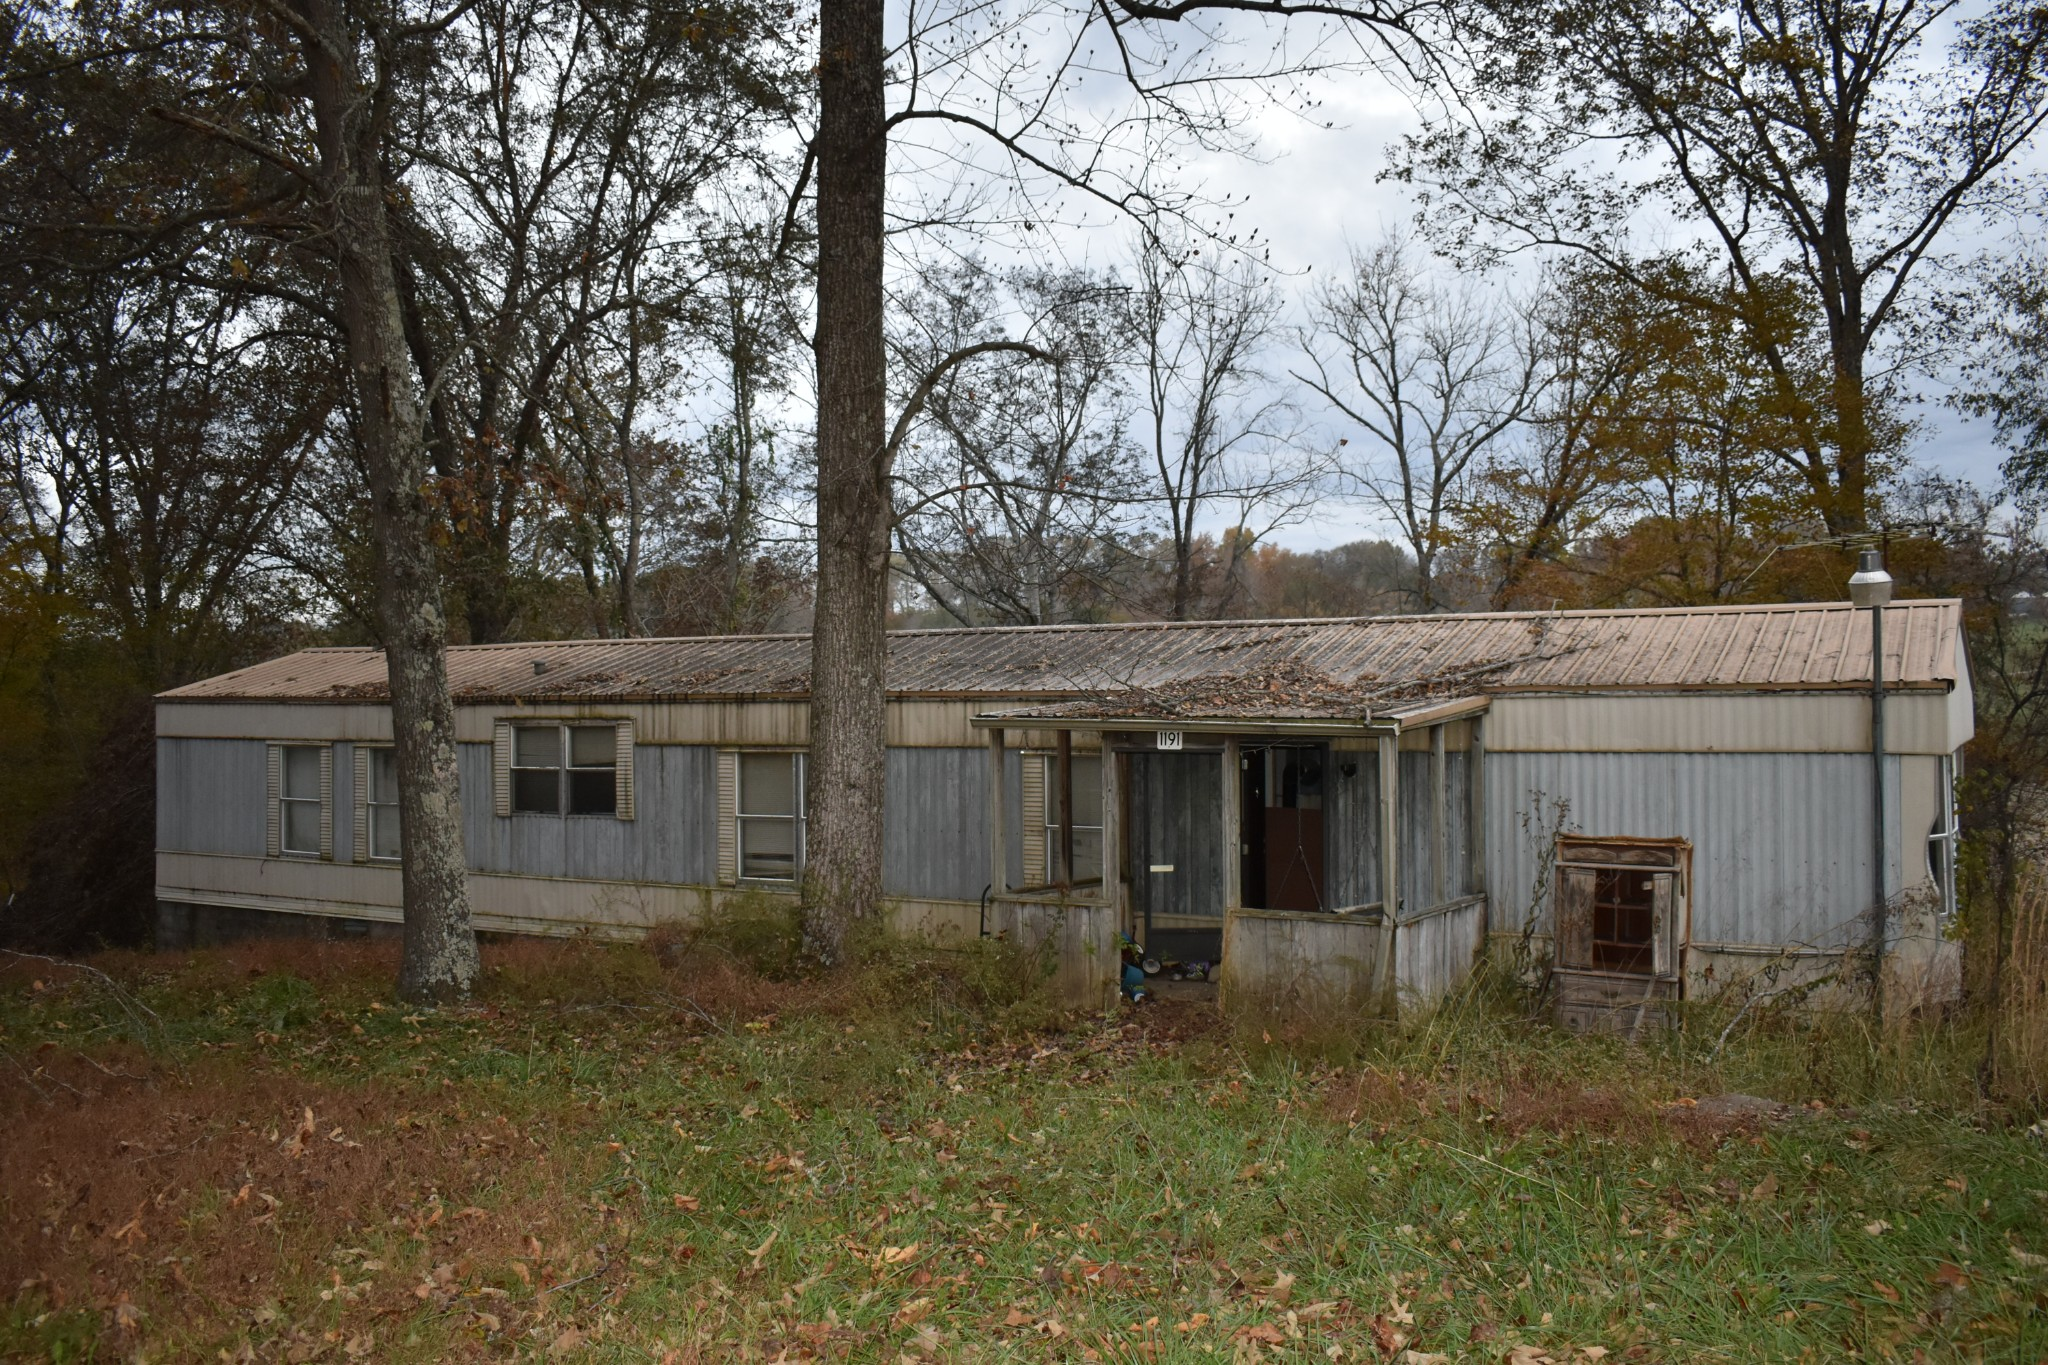 1191 Antioch Rd, Clarksville, TN 37040 - Clarksville, TN real estate listing